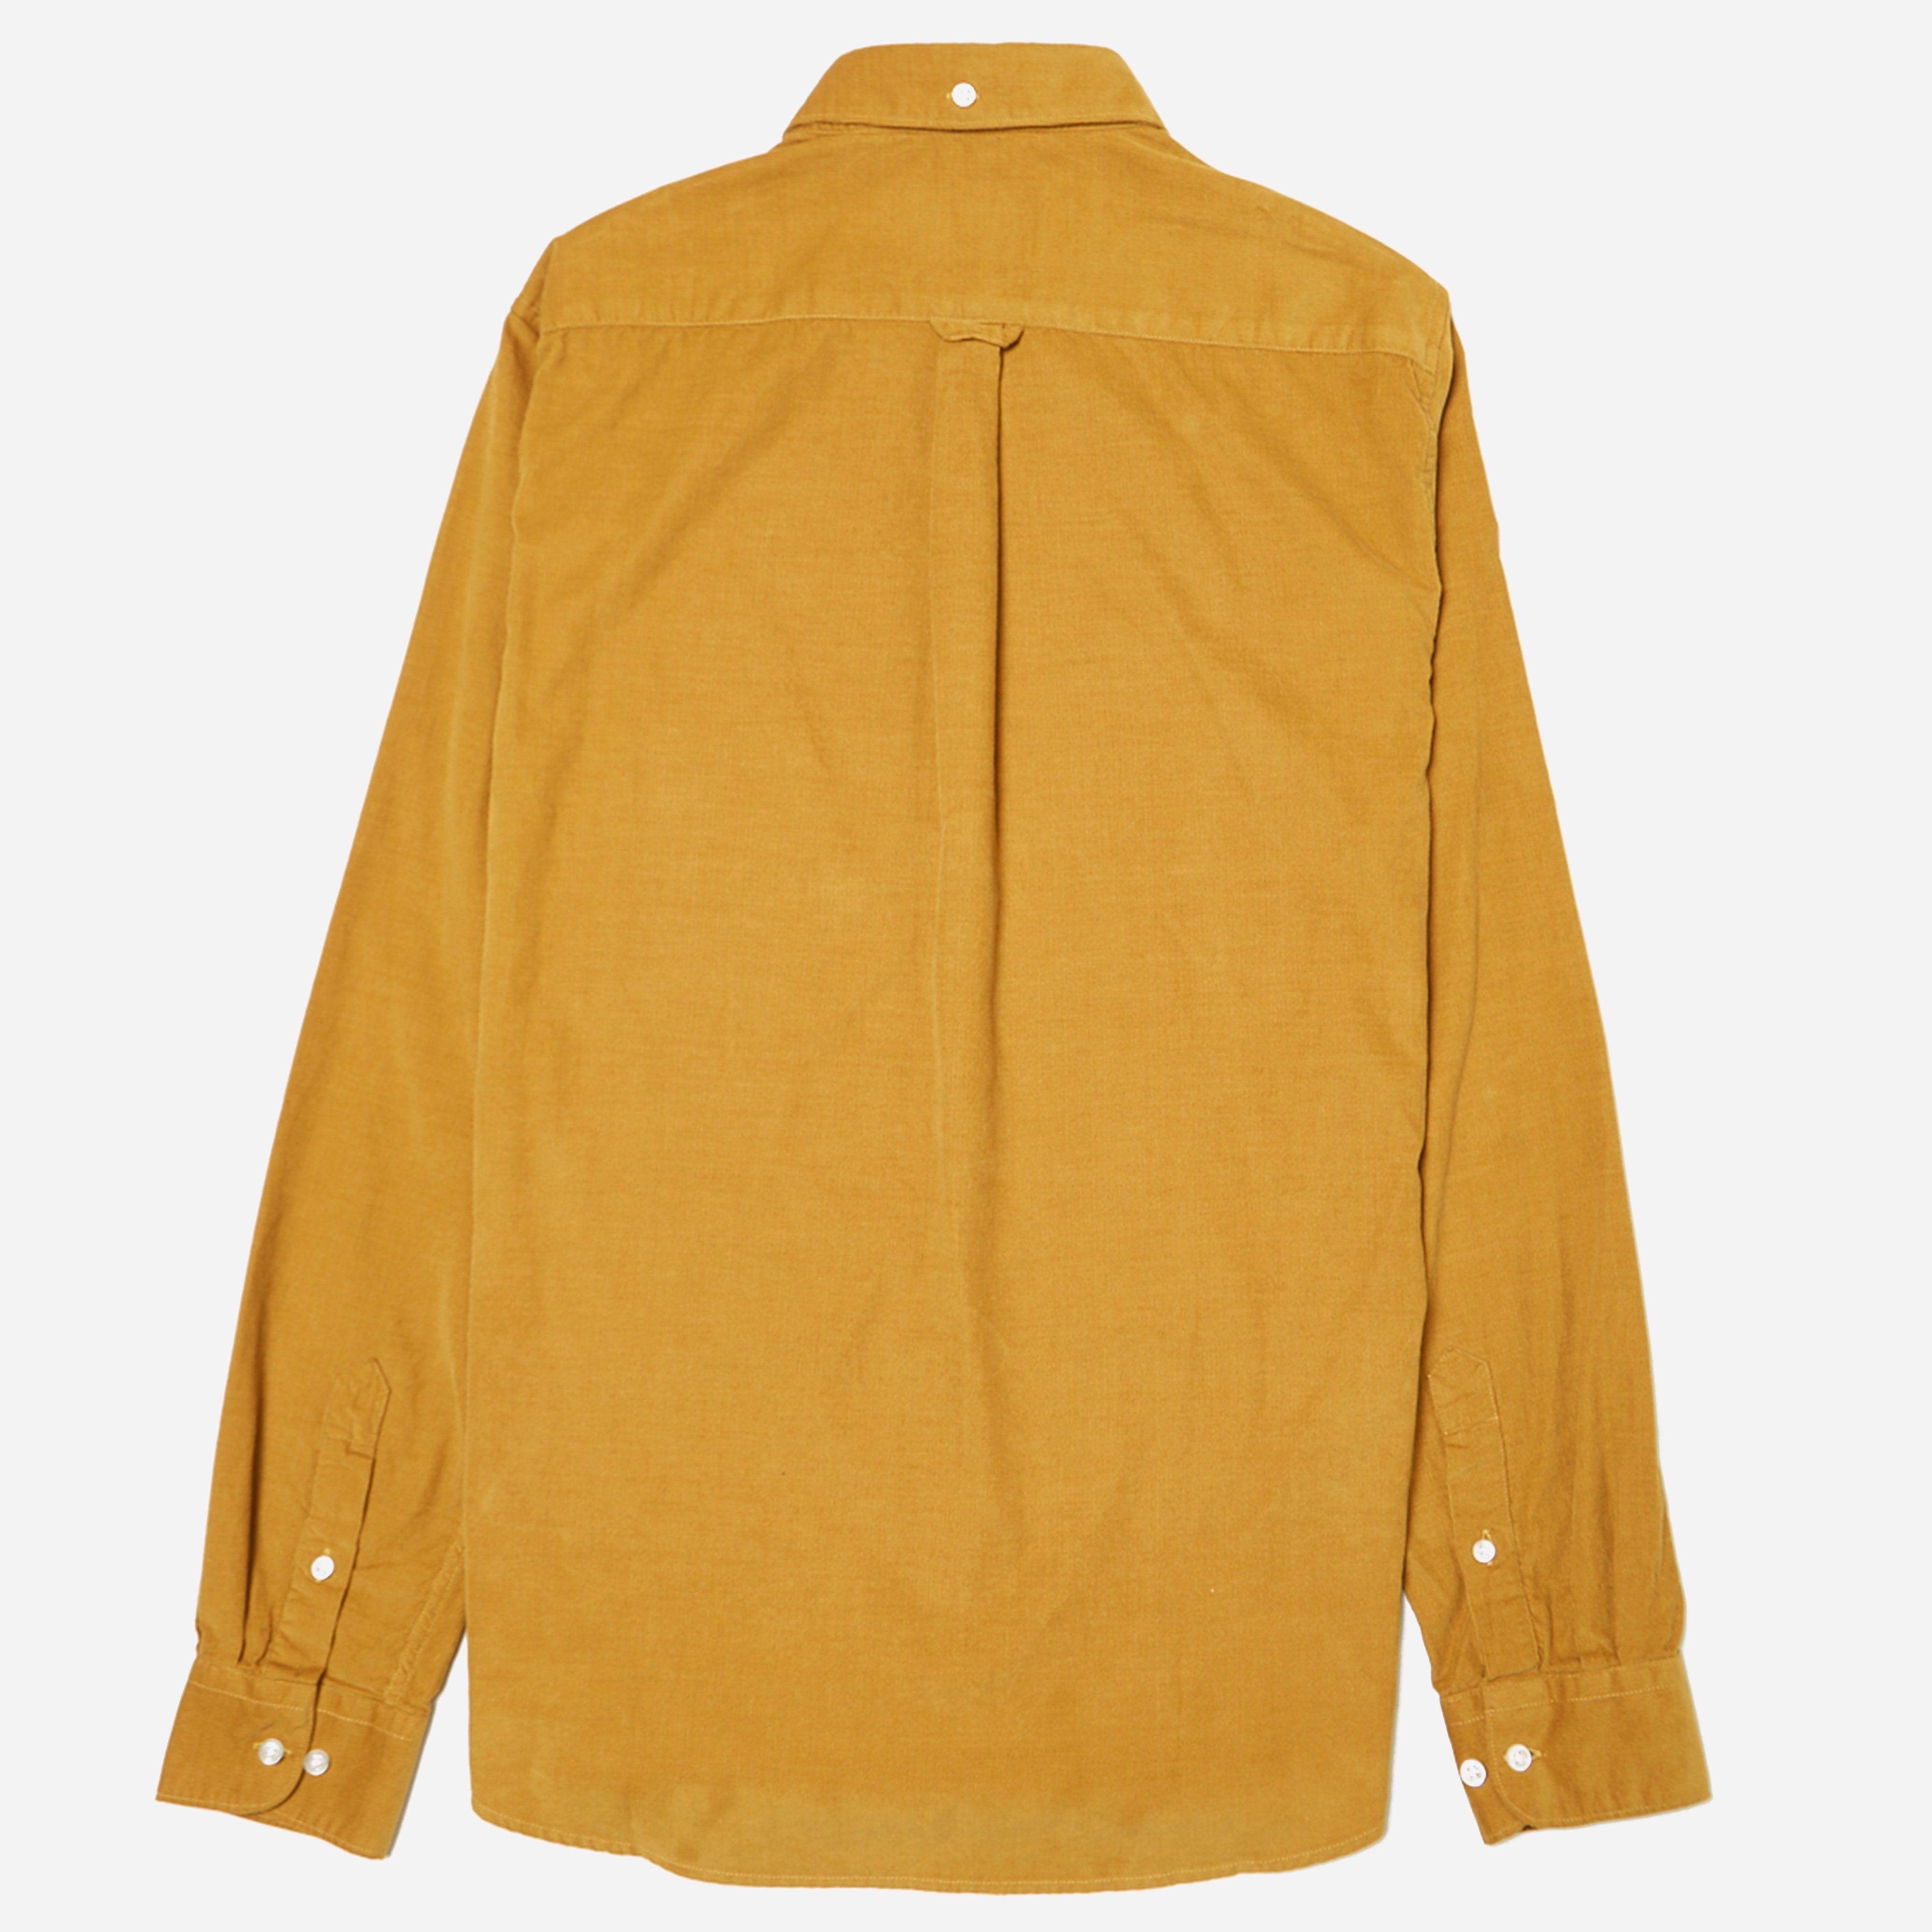 Barbour Made for Japan Parkhurst Shirt